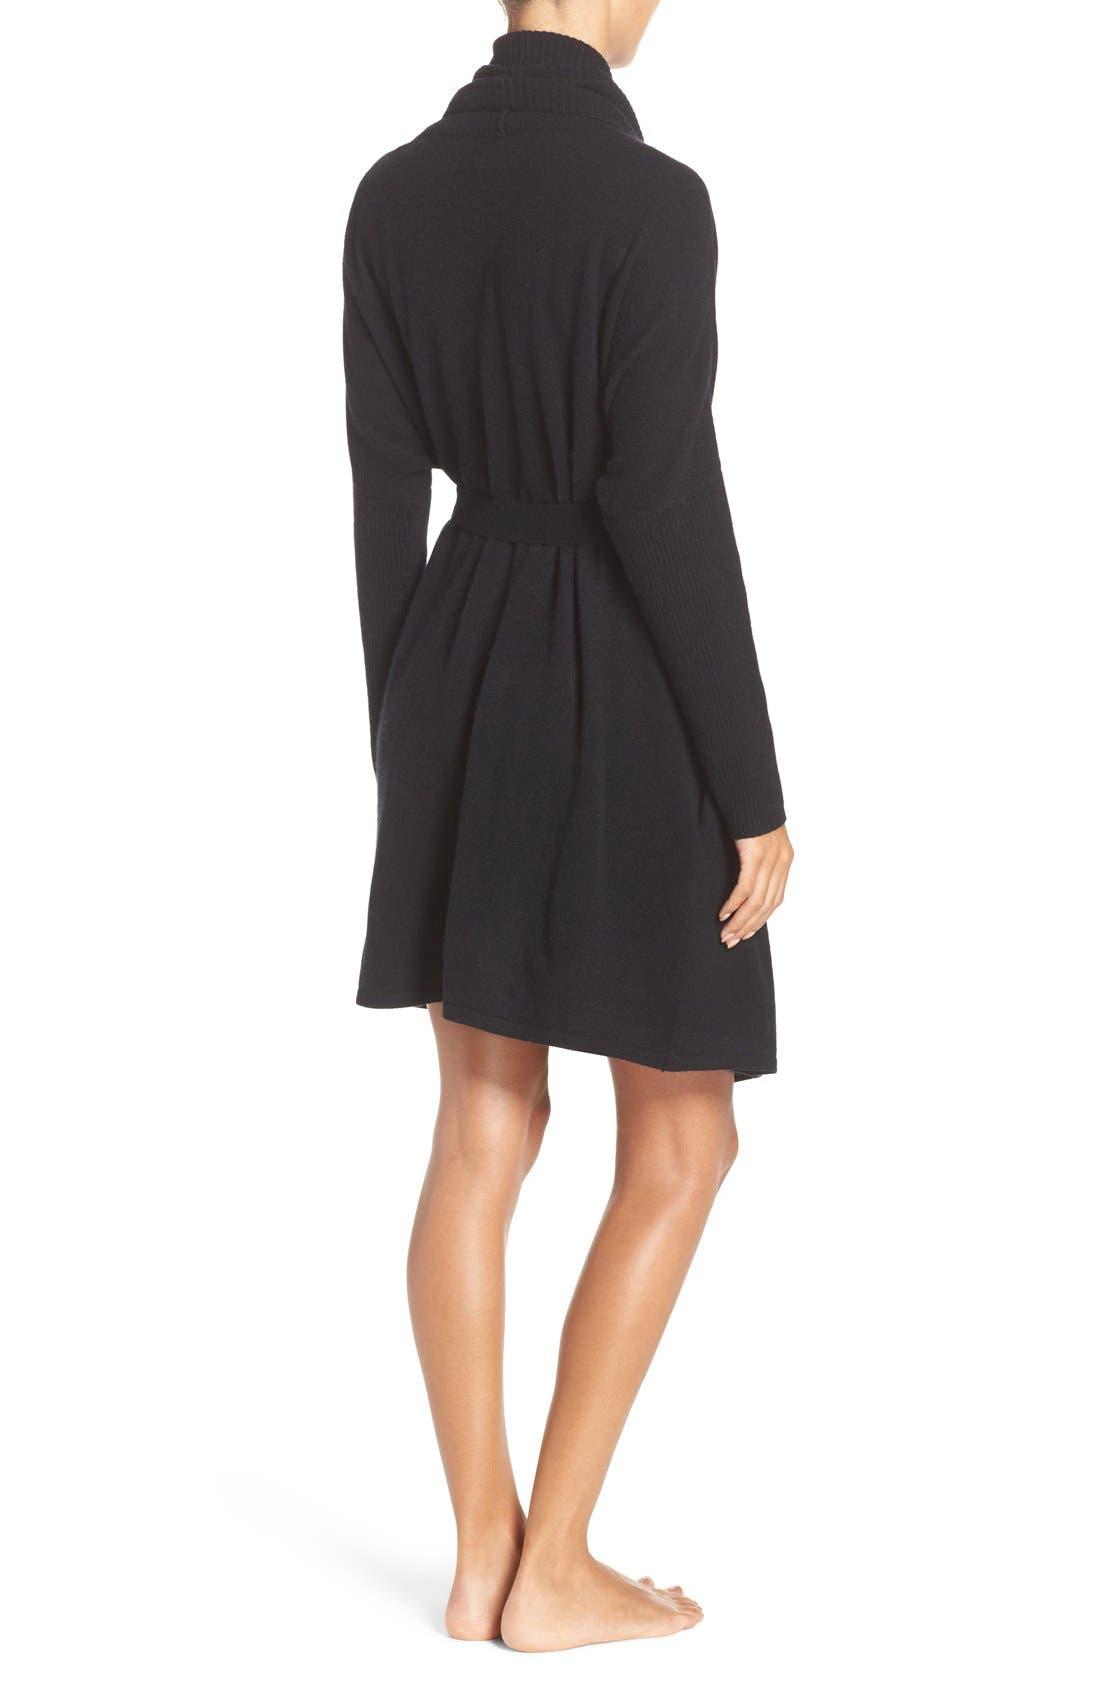 UGG 'Cheyenne' Cashmere Robe,                             Alternate thumbnail 2, color,                             Black